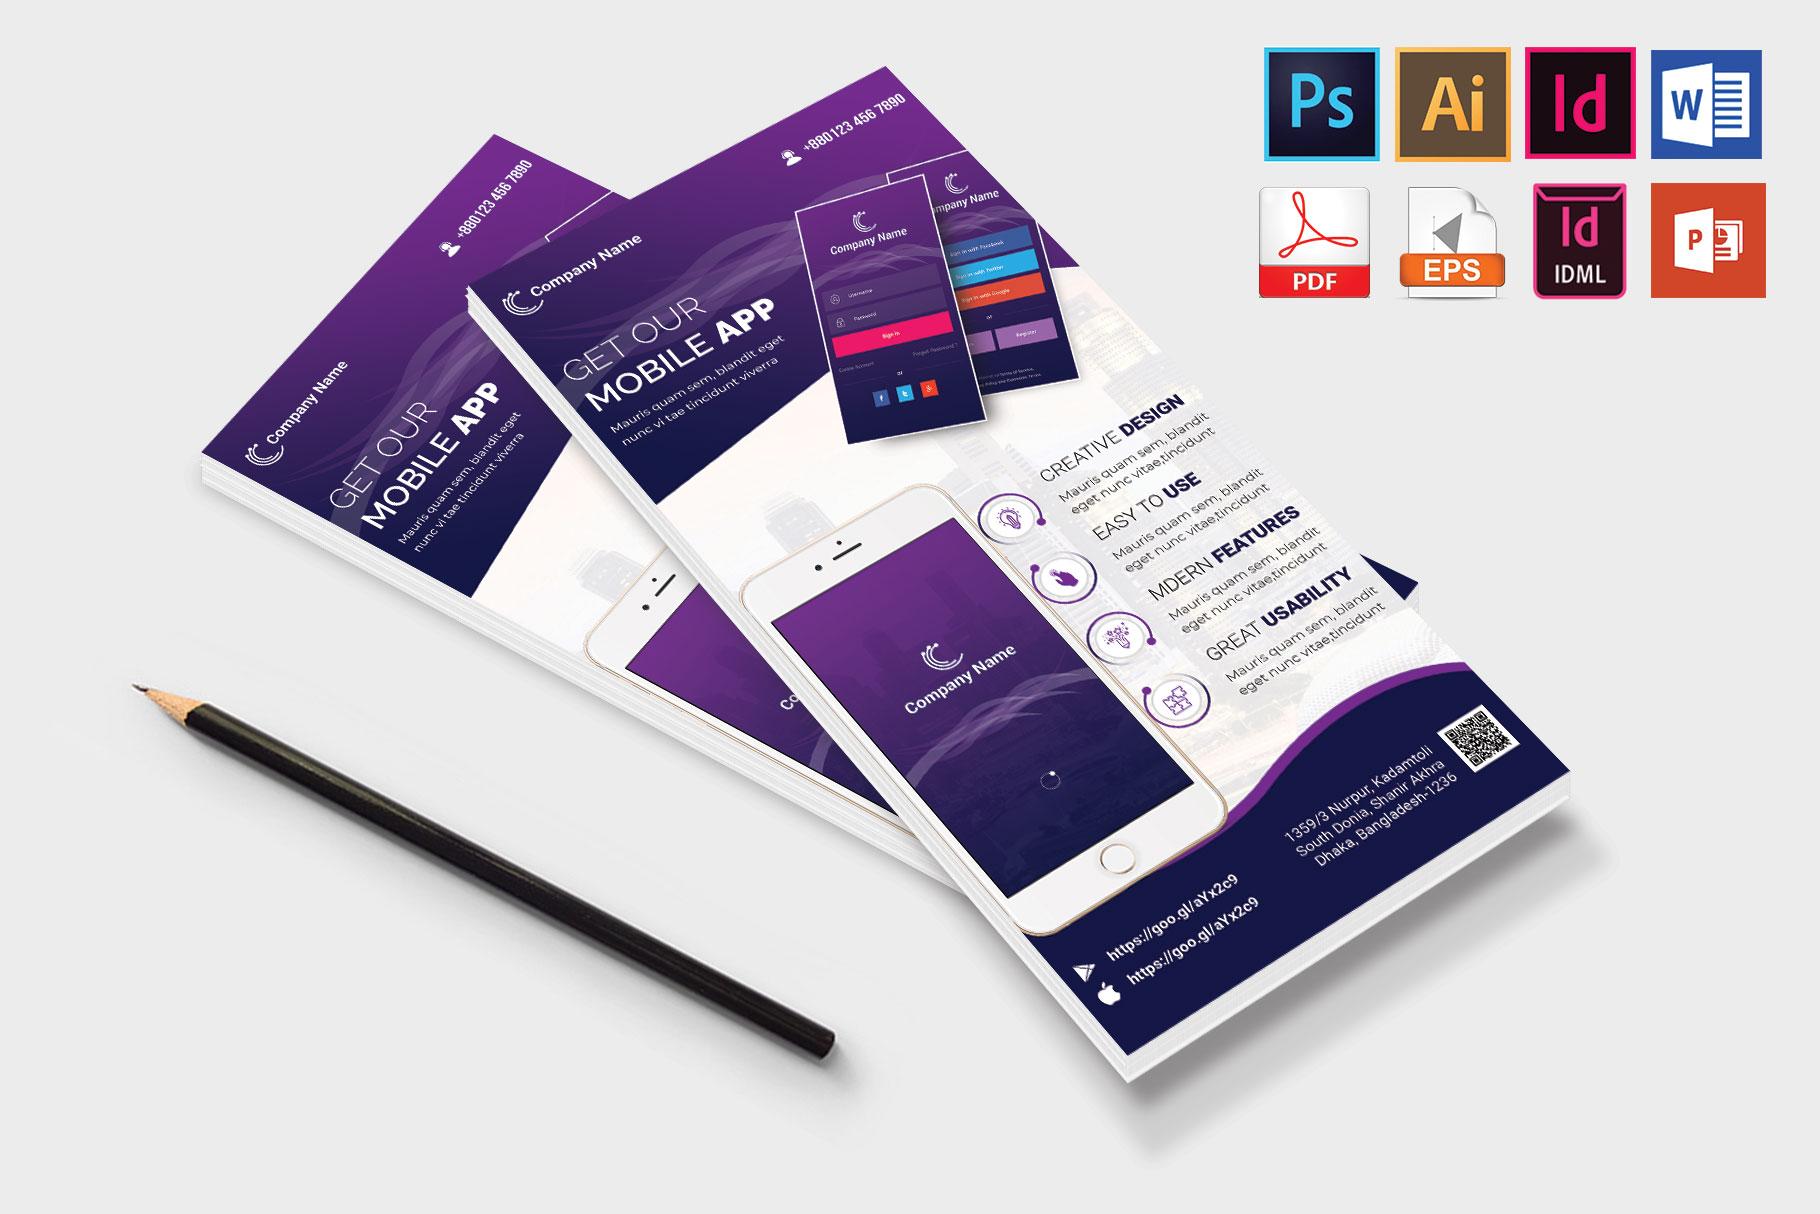 Mobile App Promotion DL Flyer Vol-01 example image 4